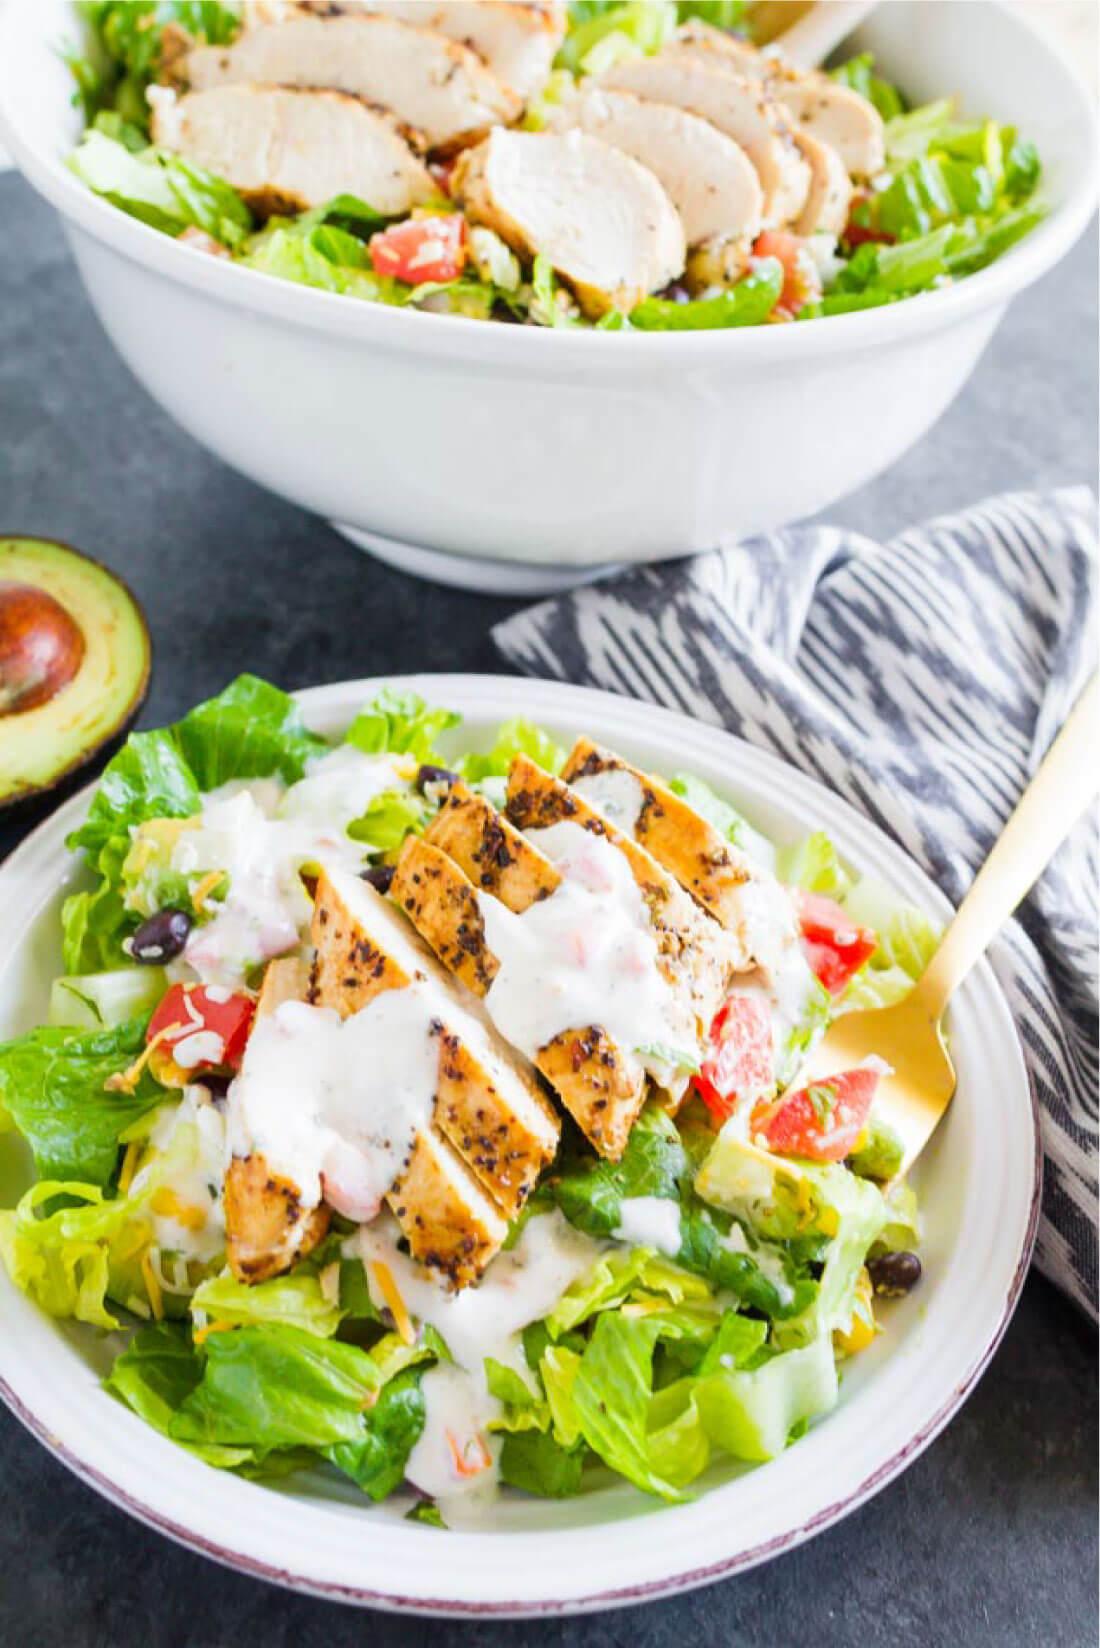 Santa Fe Chicken Salad - a simple, refreshing salad recipe that's perfect for summer! from thirtyhandmadedays.com